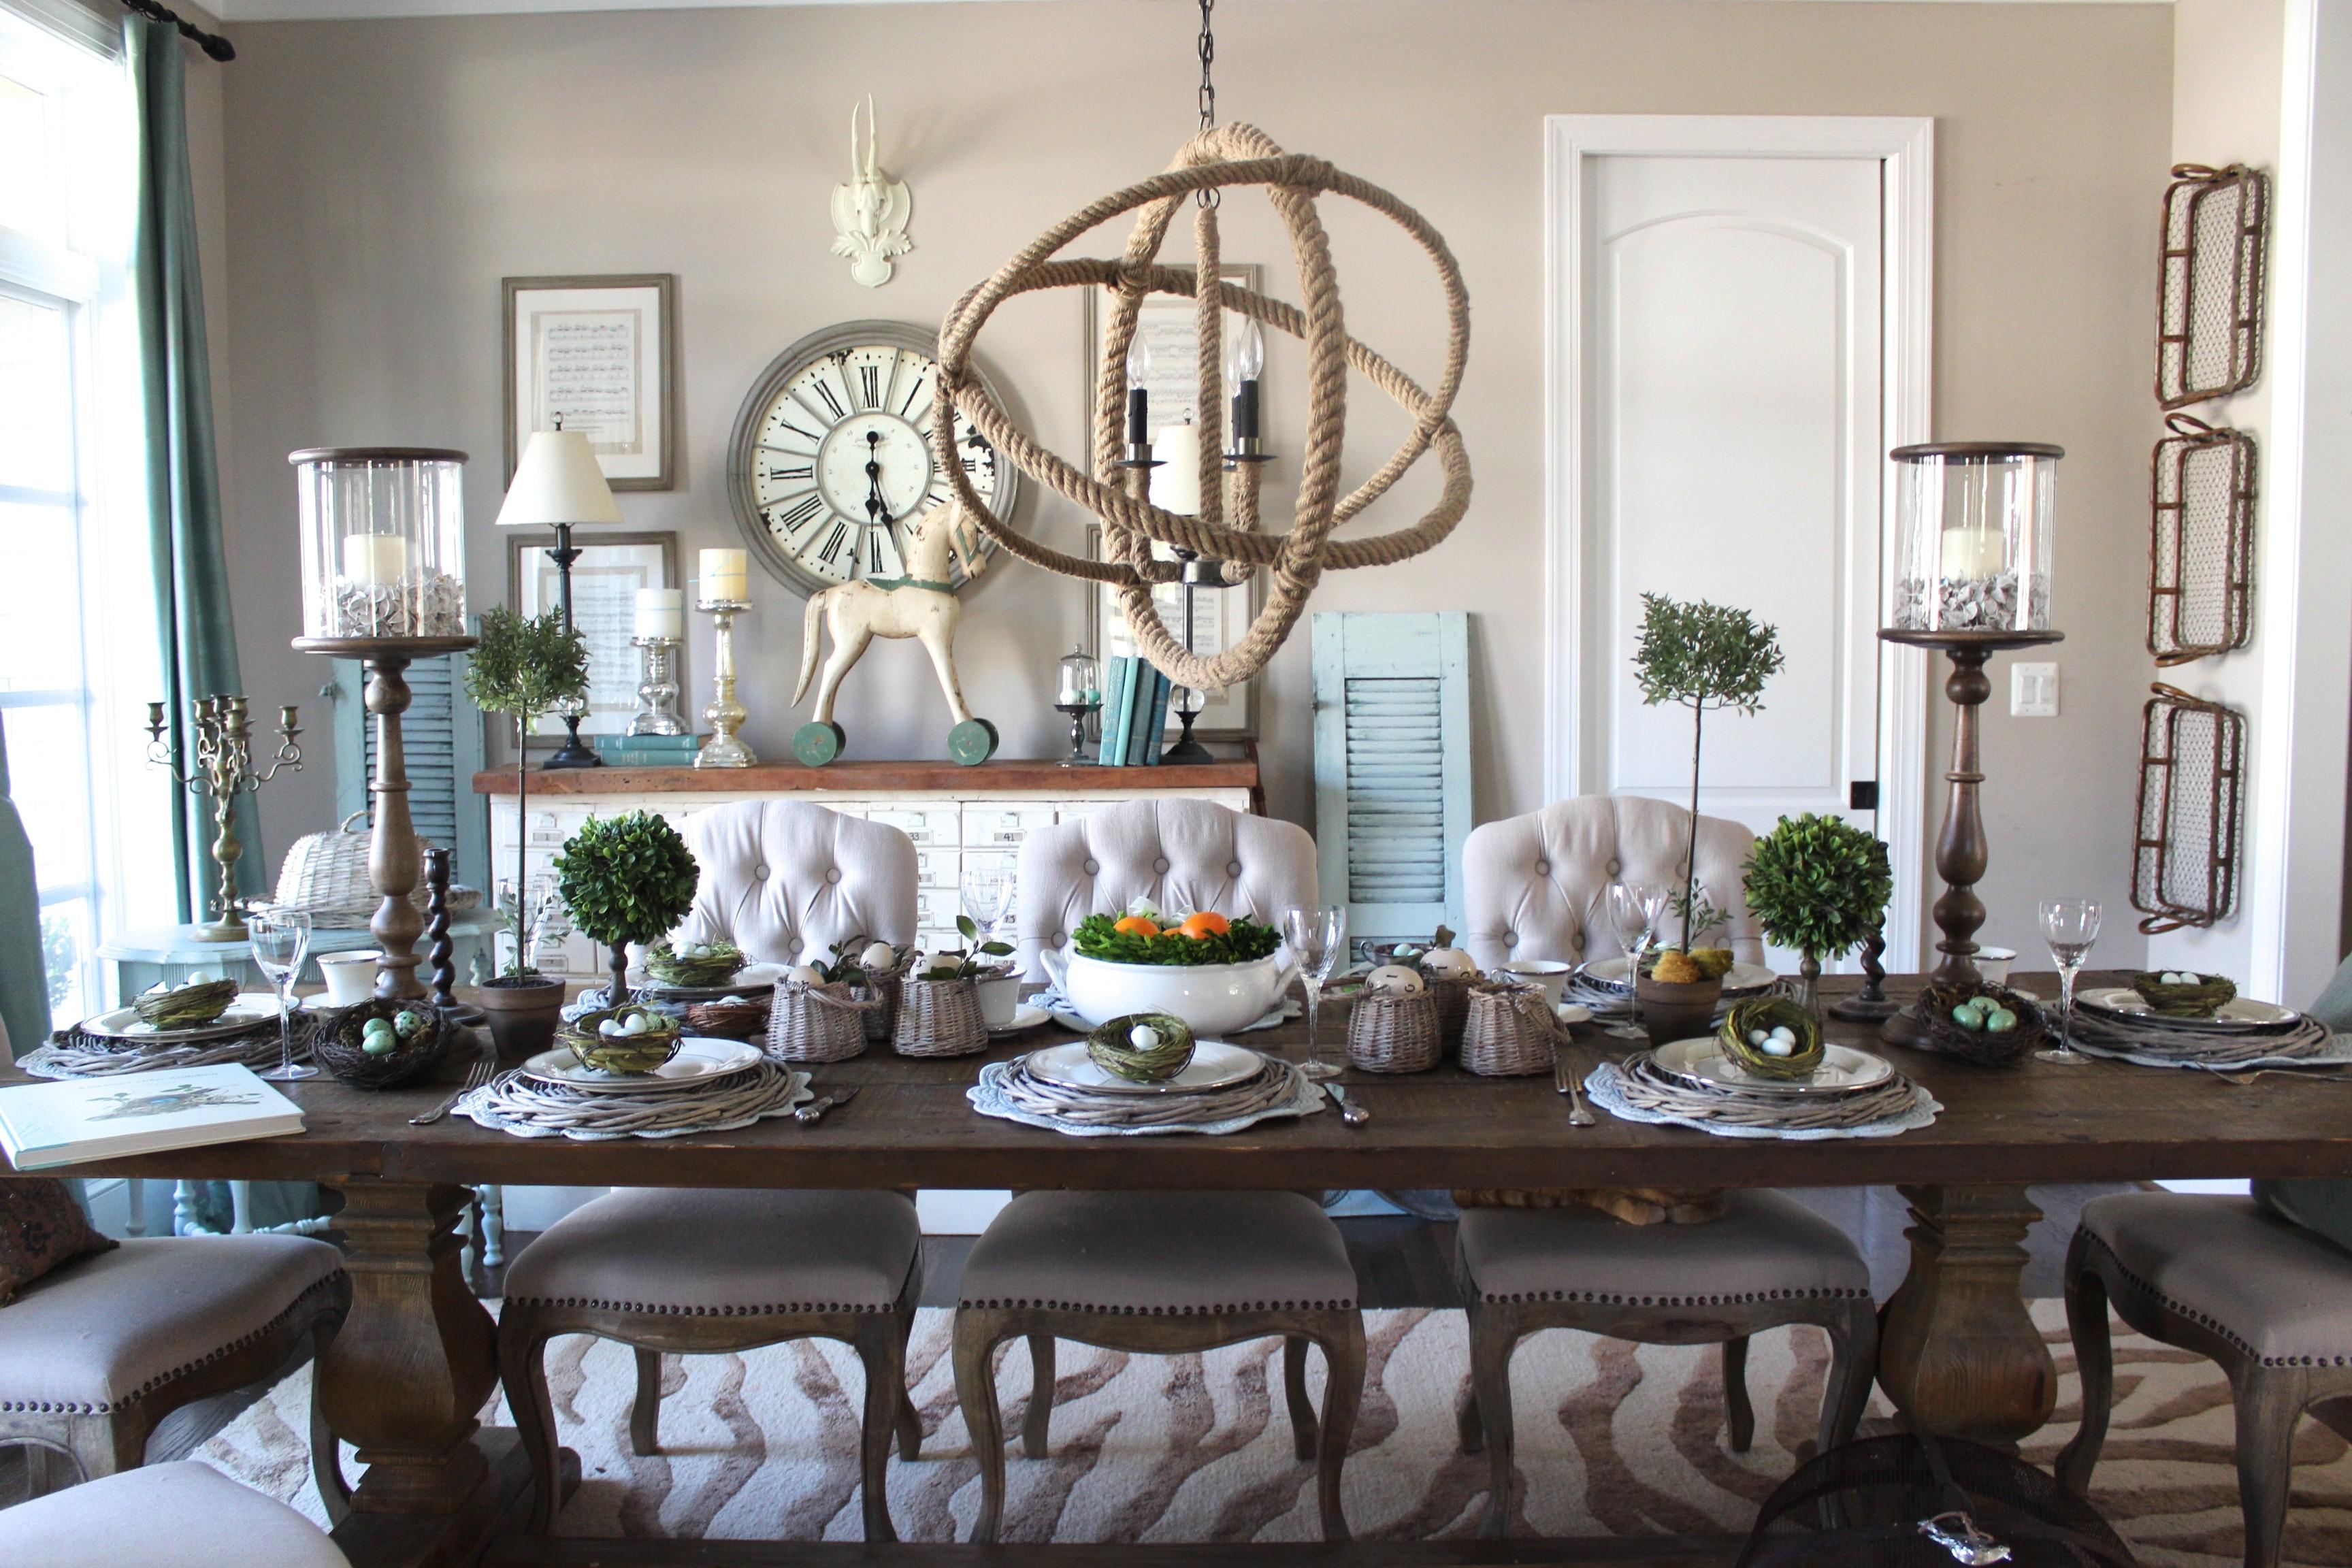 KITCHEN DINING on Pinterest White Kitchens White  : IMG8779 from www.pinterest.com size 3456 x 2304 jpeg 1438kB